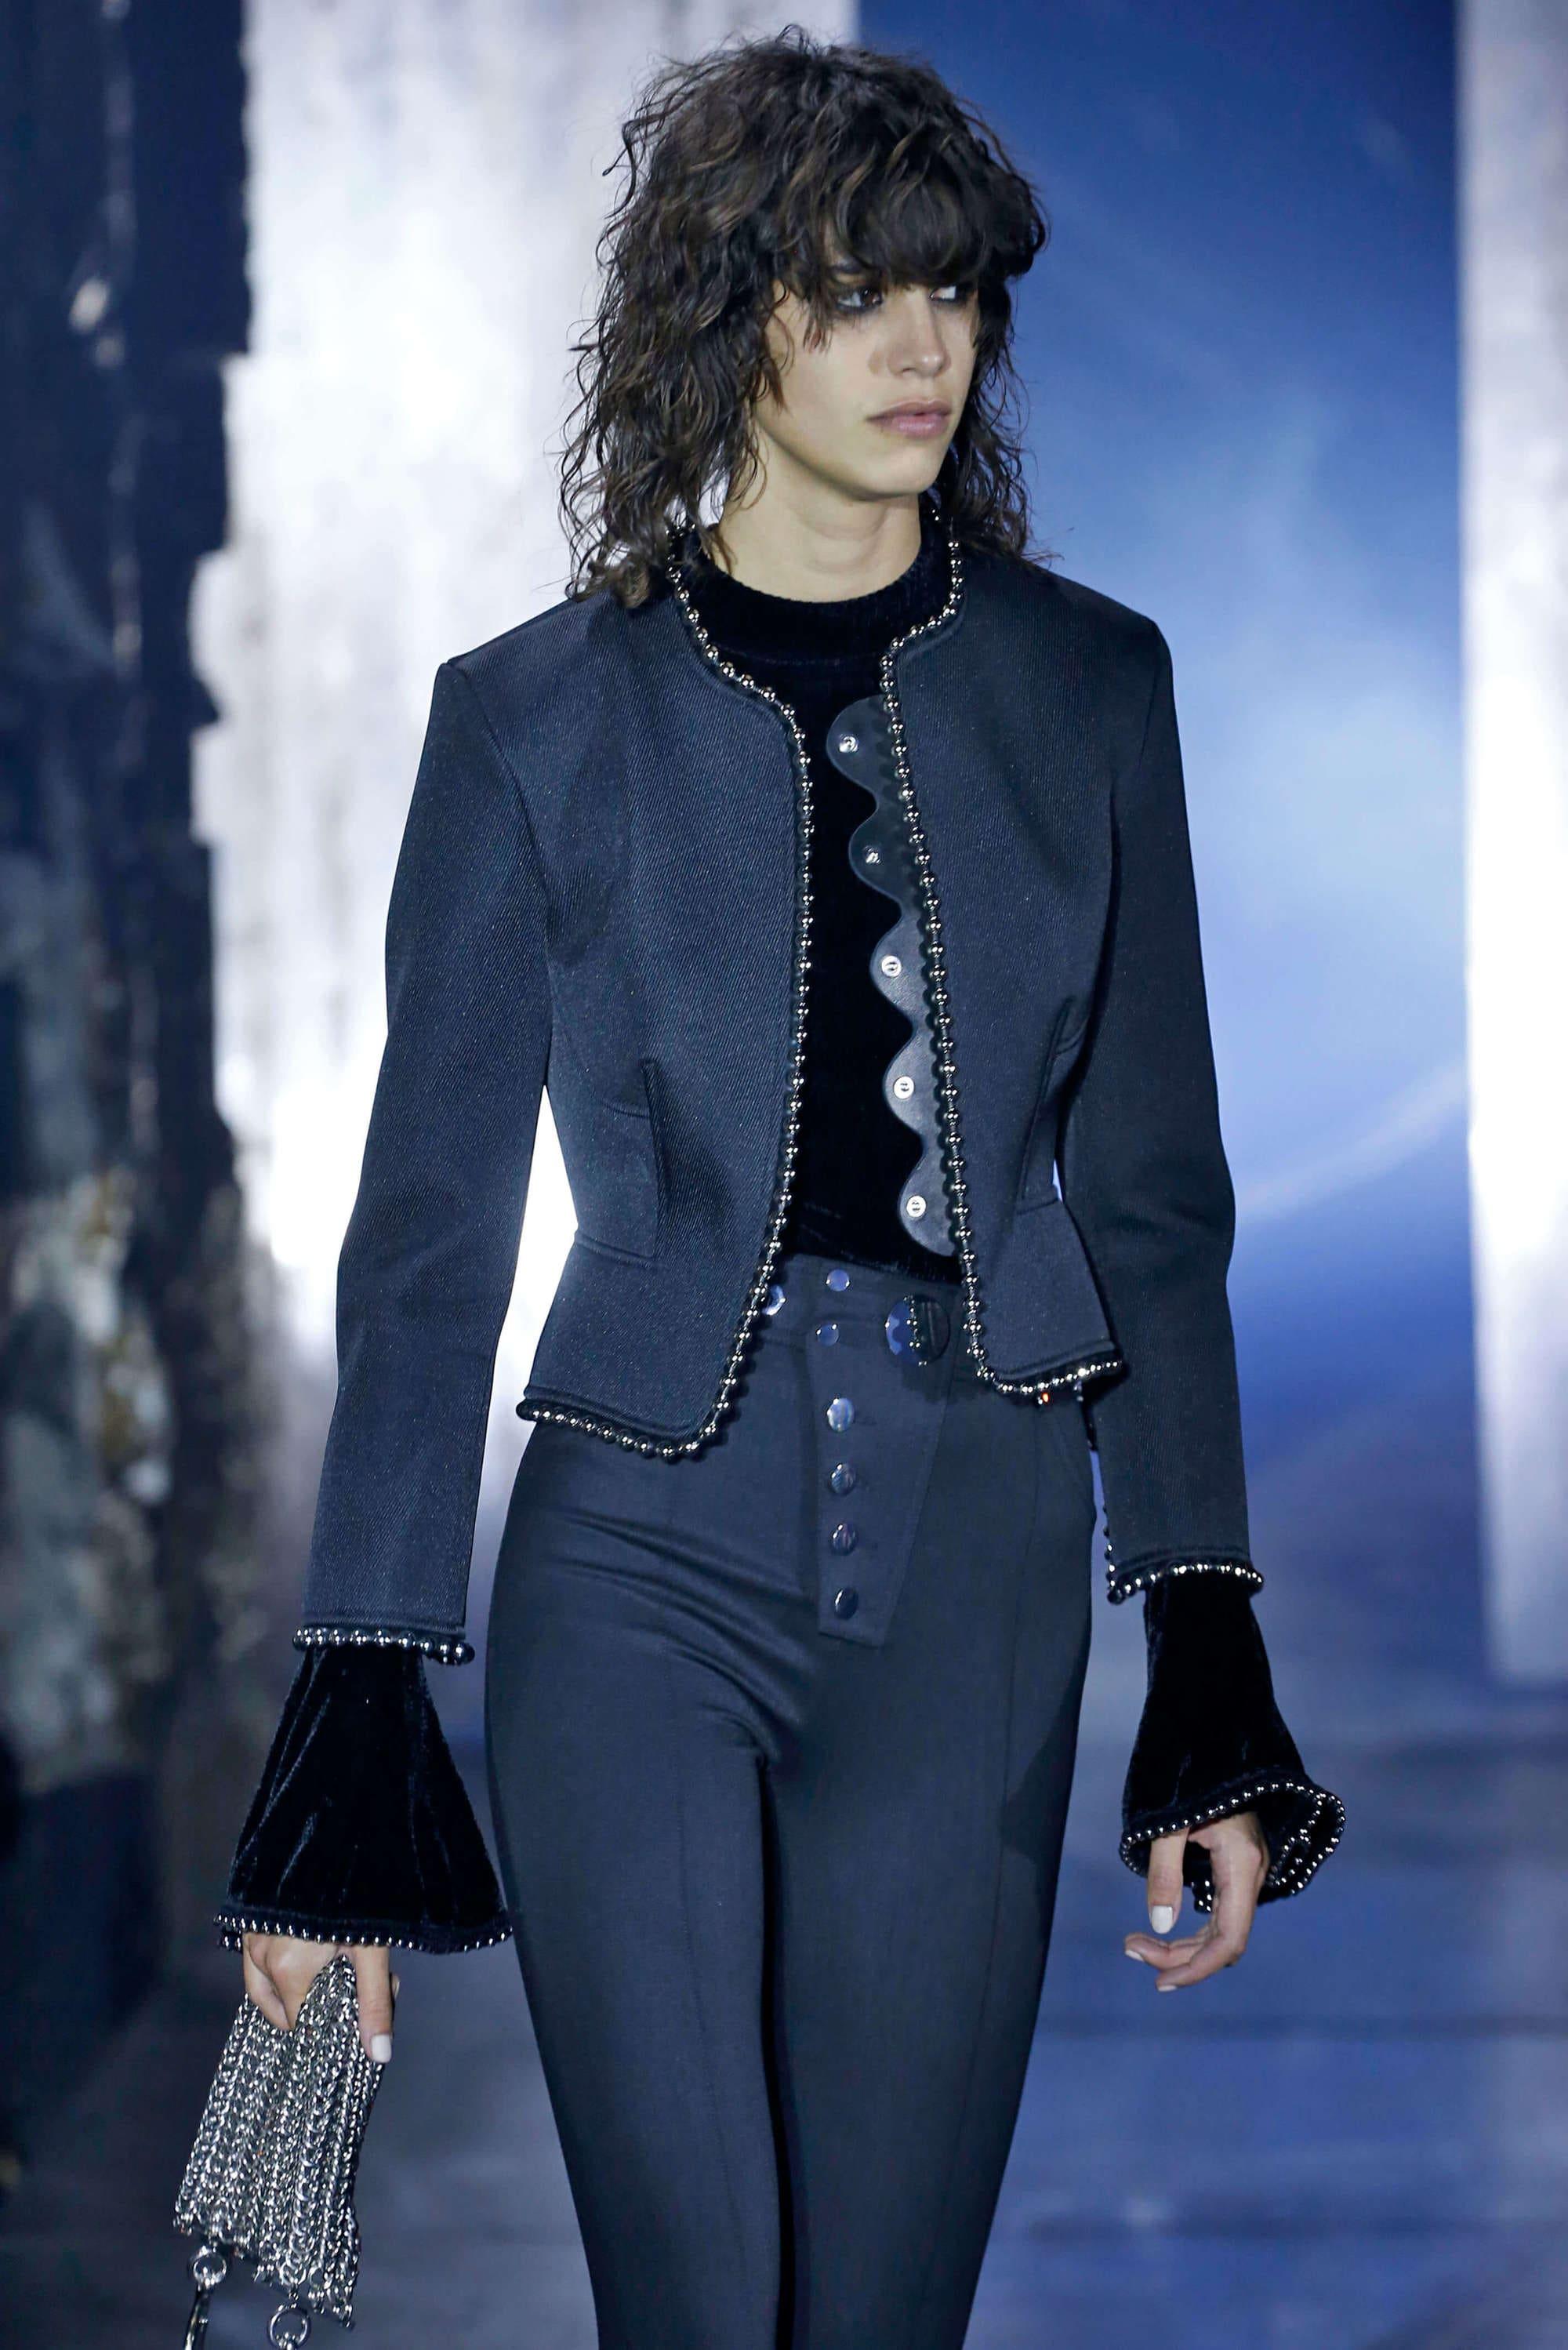 a female model with short choppy curly hair on a runway